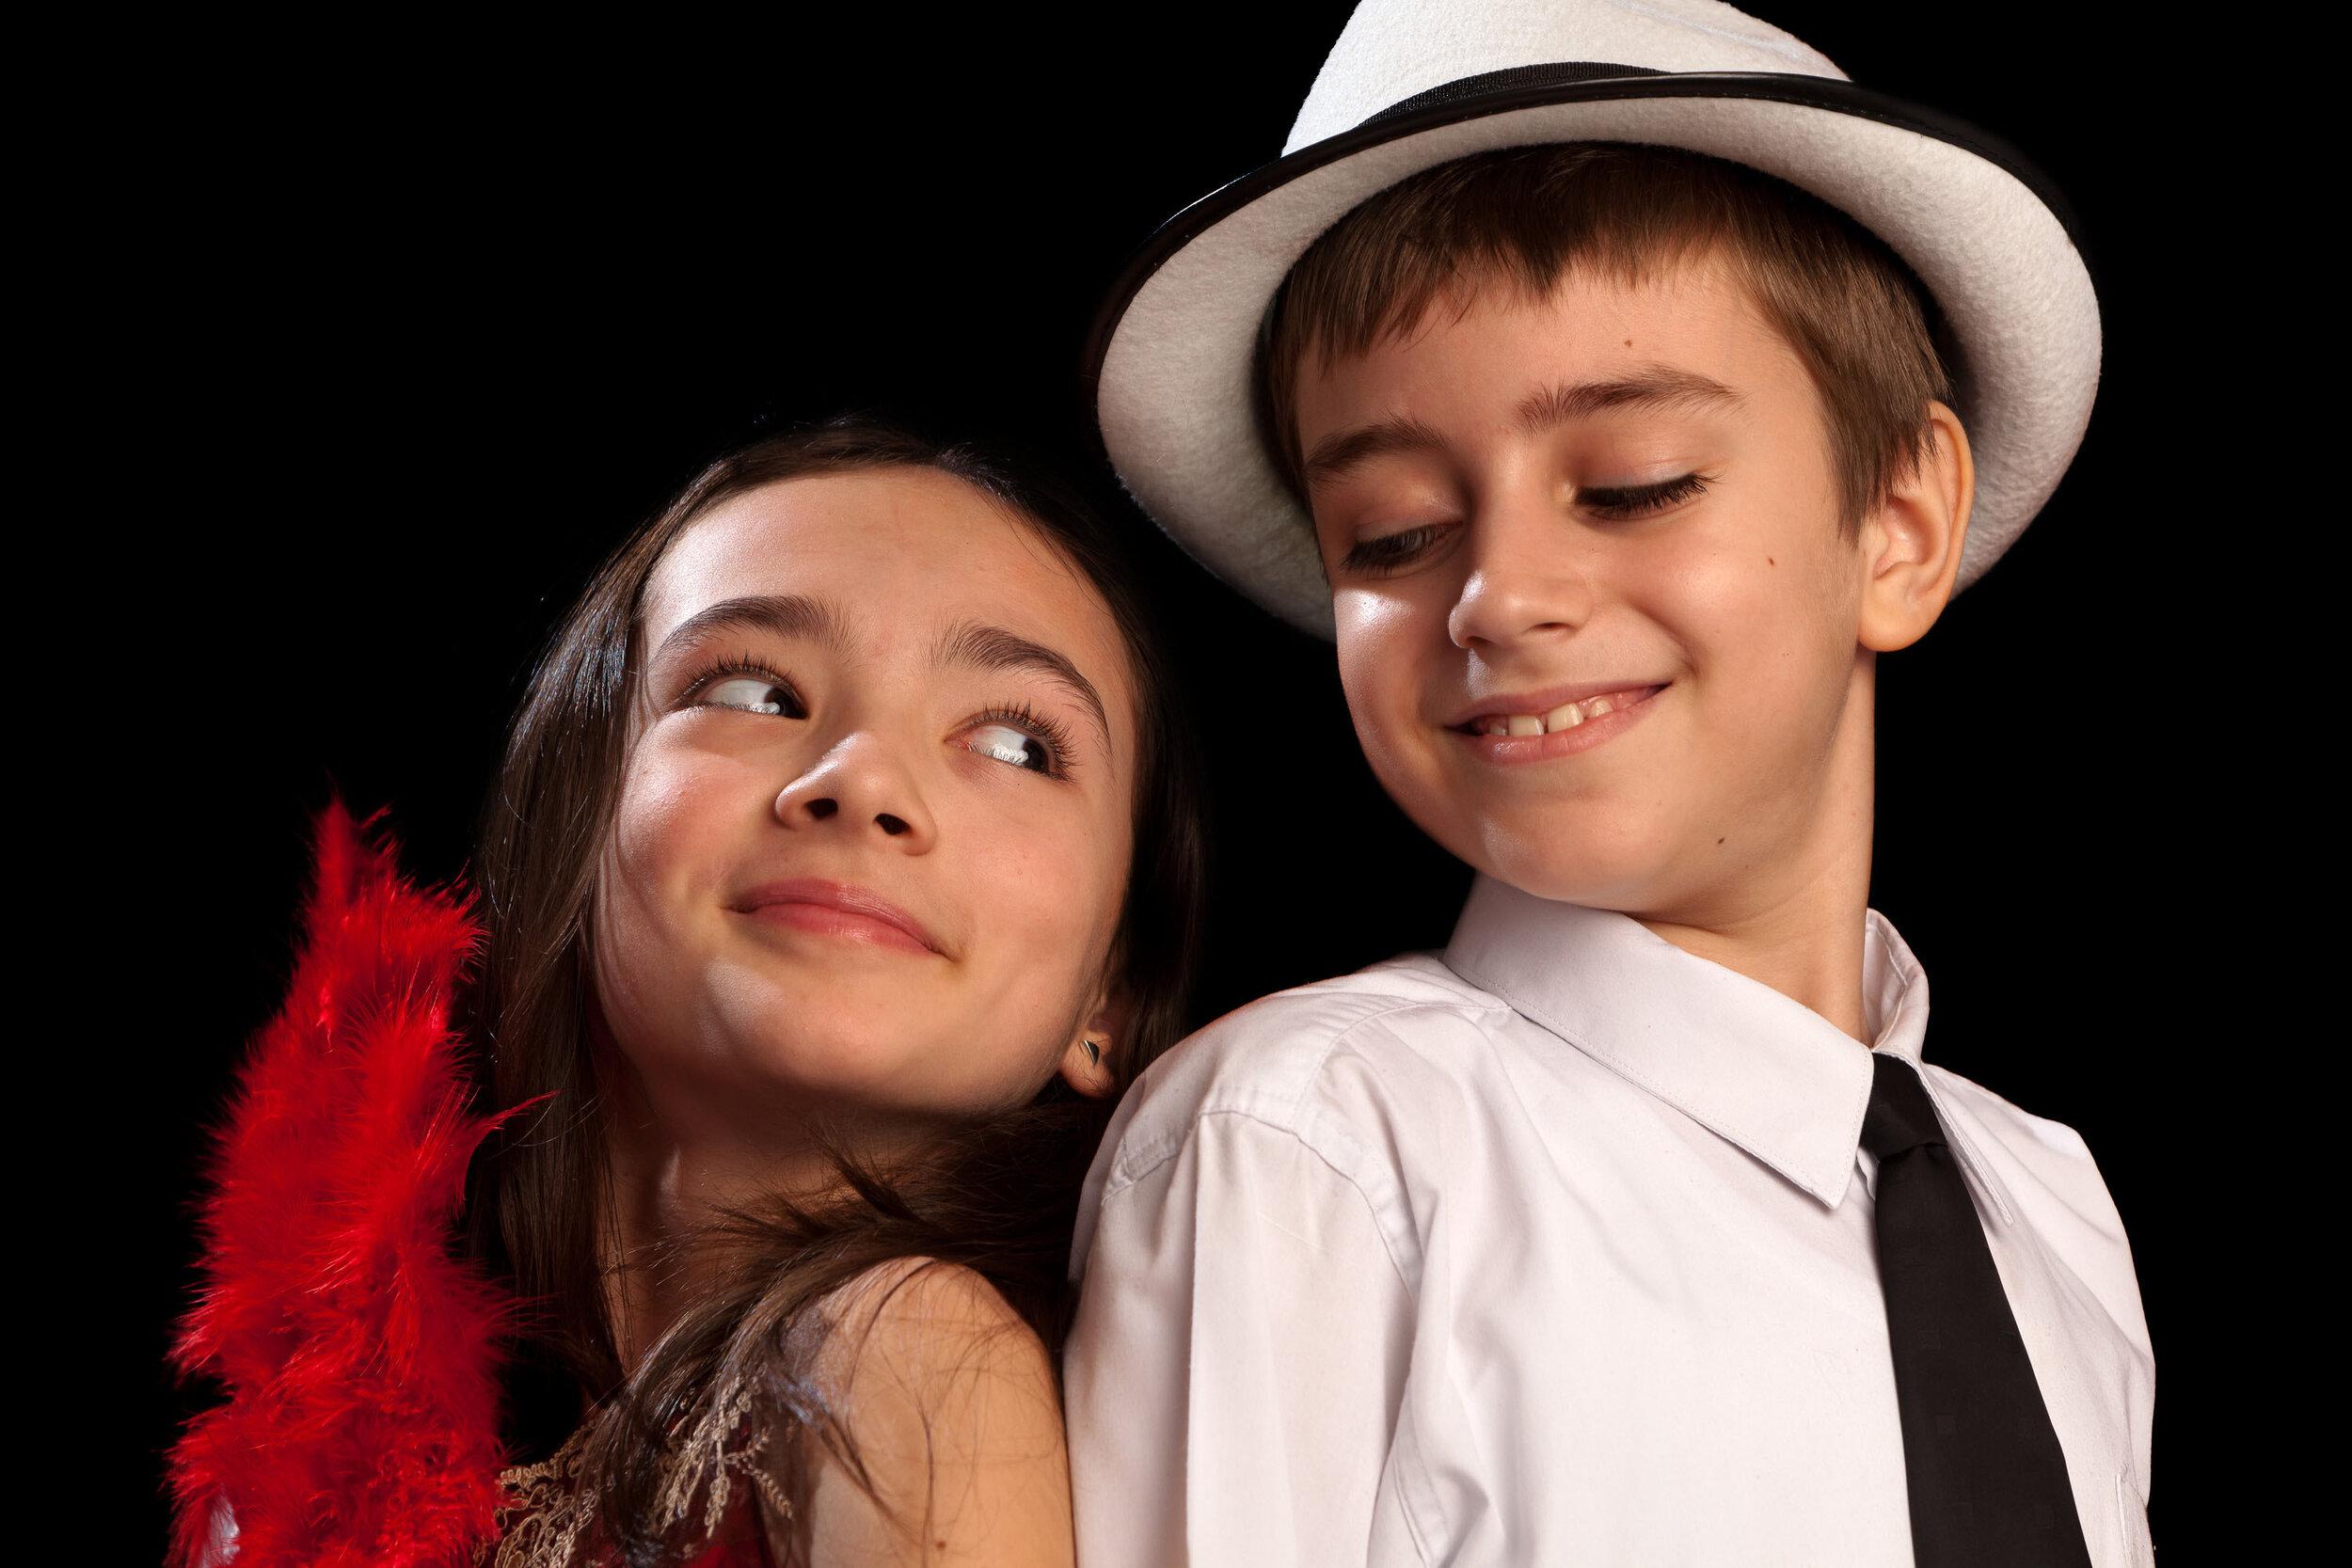 Kids_couple_ready_to_dance.jpg